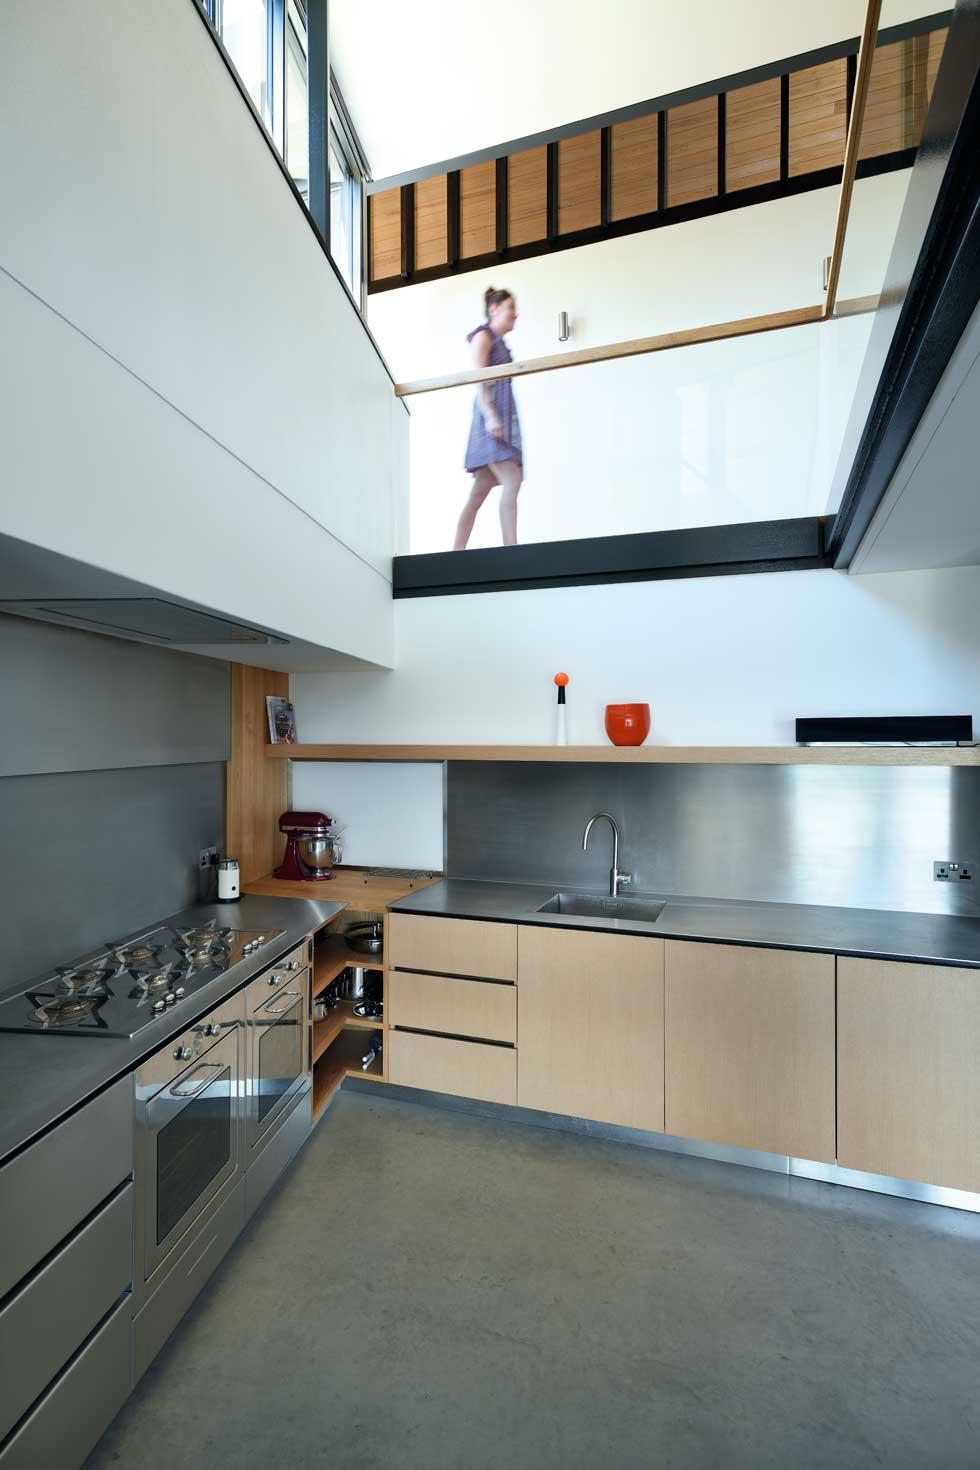 Contemporary kitchen in this Cornish coastal home